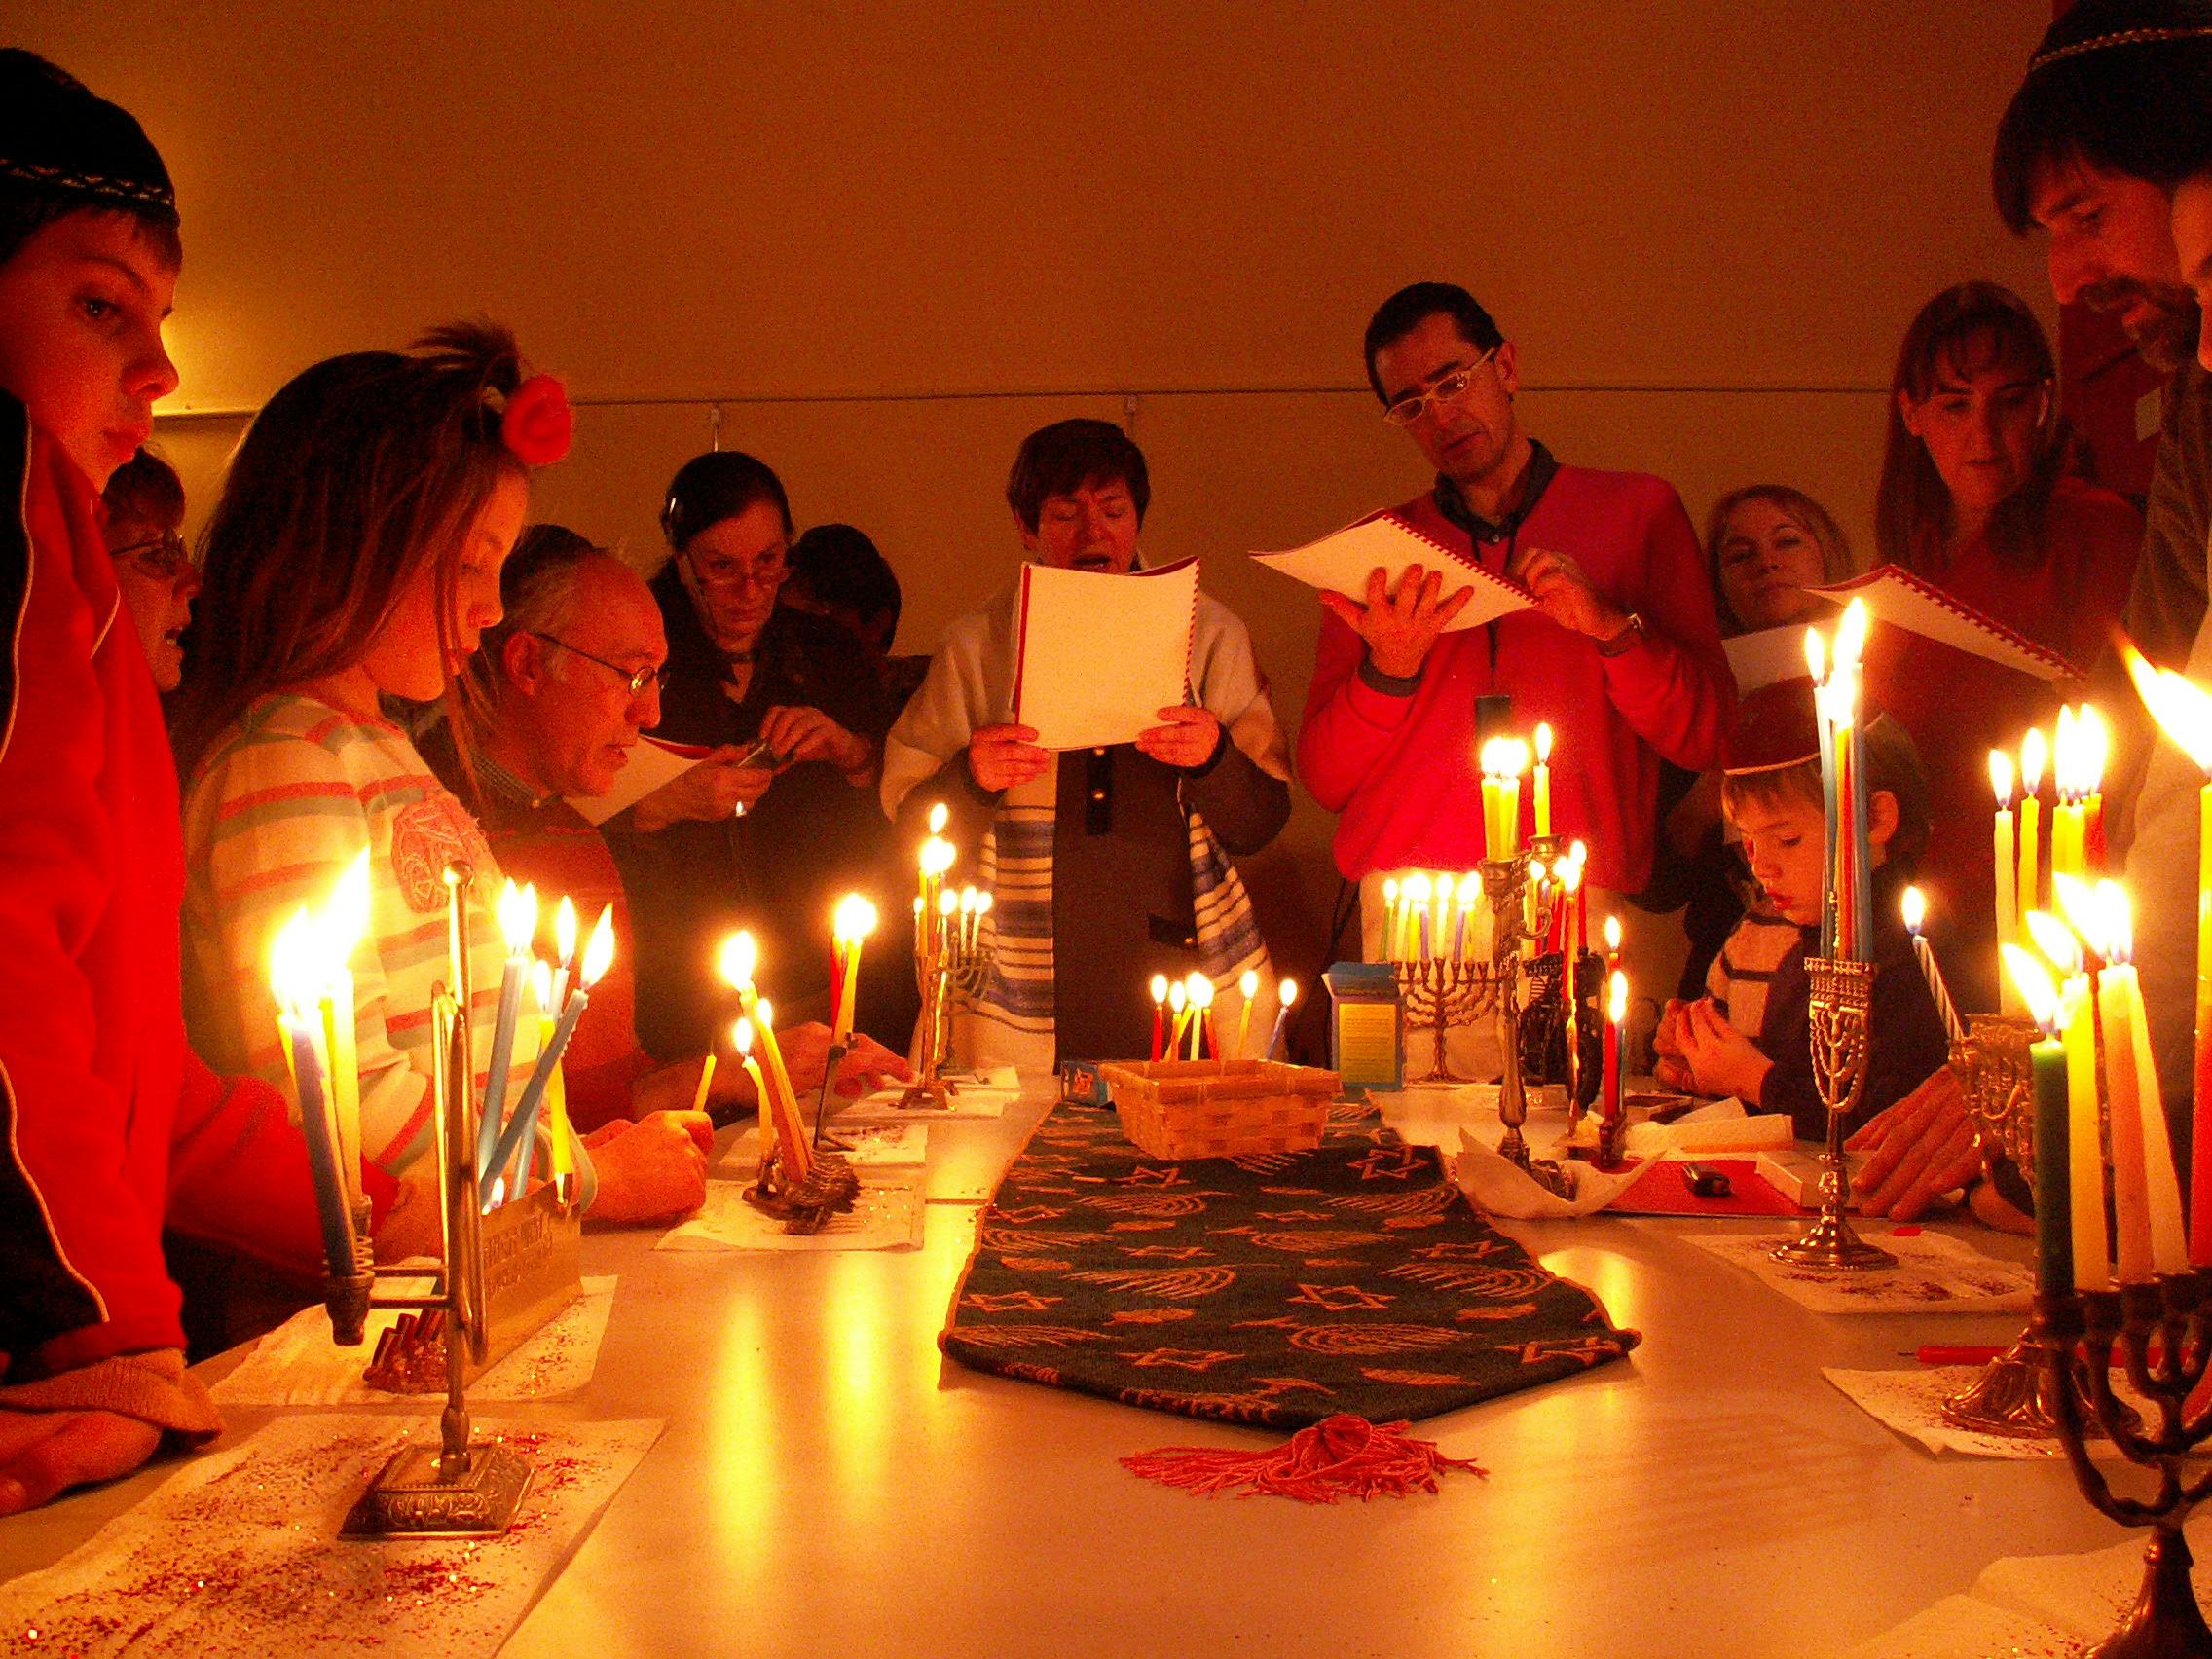 Chanukah Candle Lighting Blessings  sc 1 st  Rabbi Barbara Aiello & Chanukah Candle Lighting Blessings - Rabbi Barbara